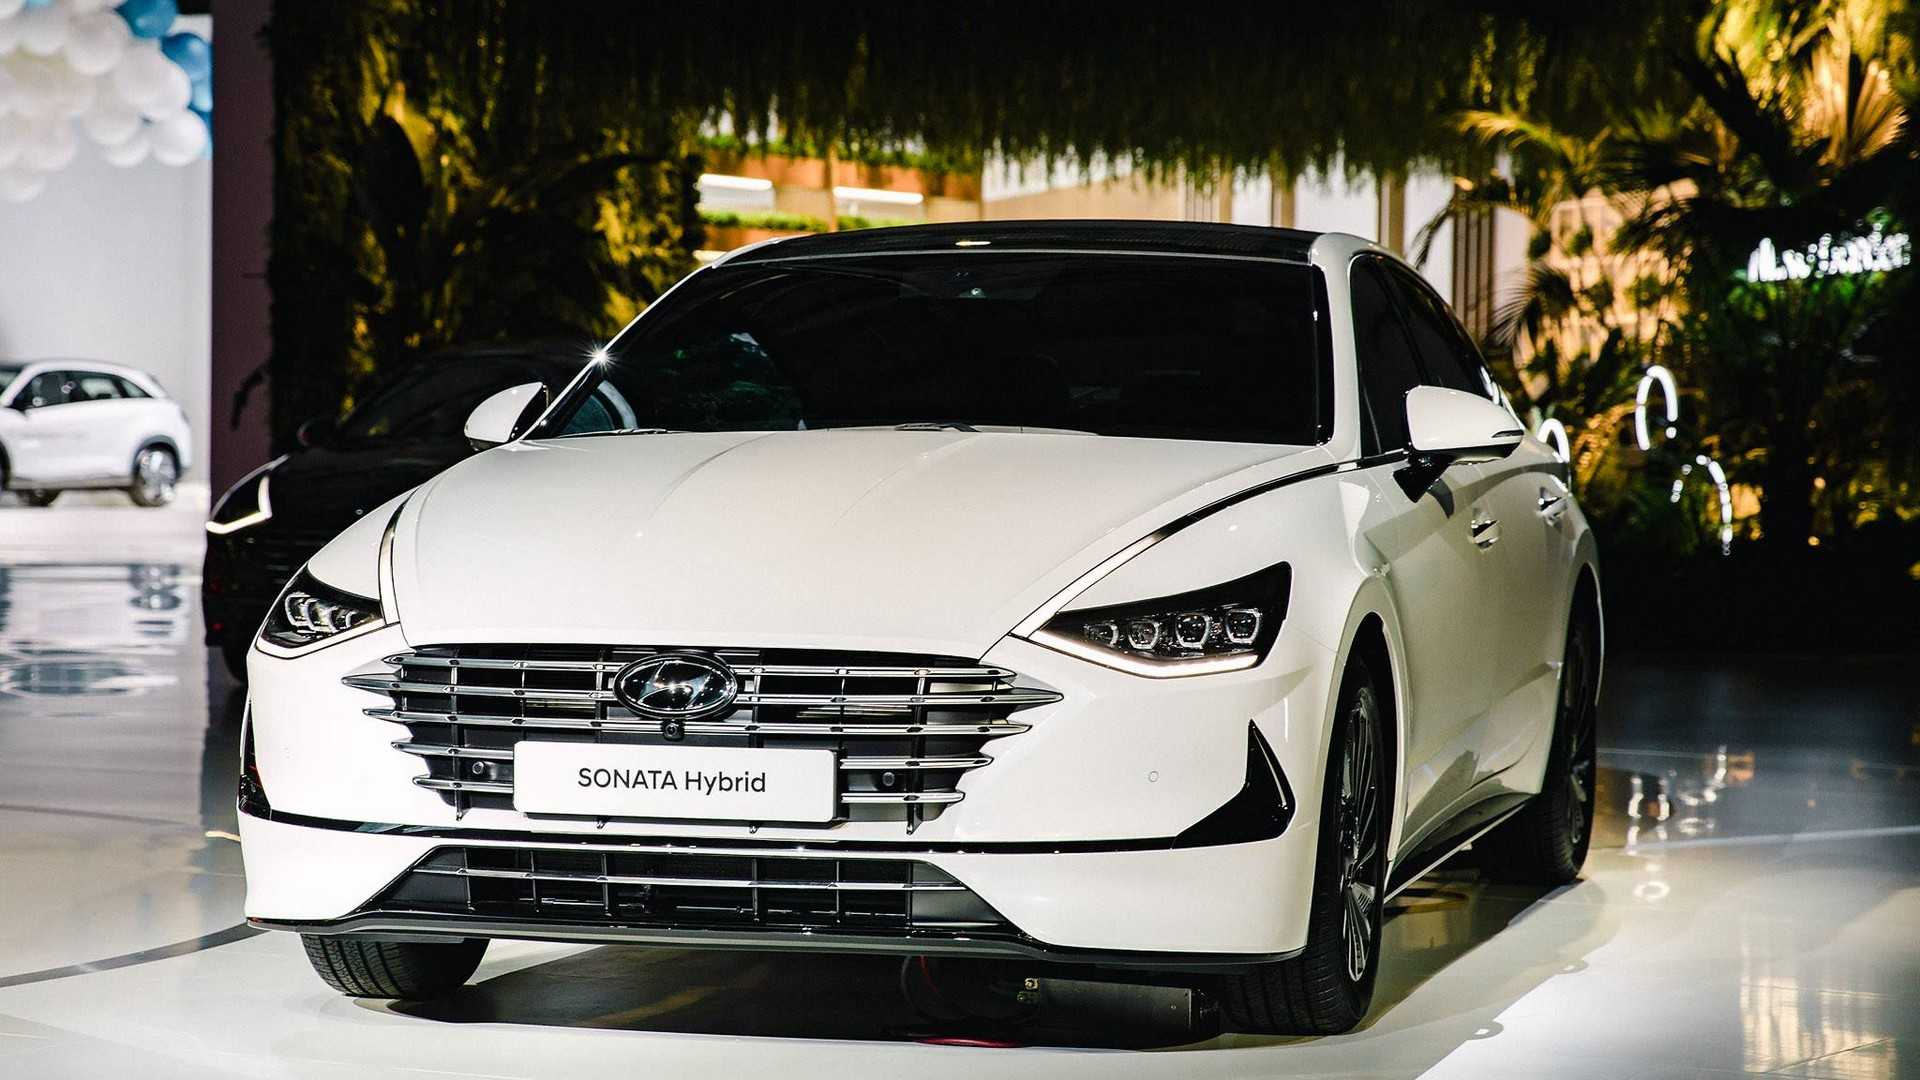 2020 Hyundai Sonata Hybrid Debuts with Solar Roof 6